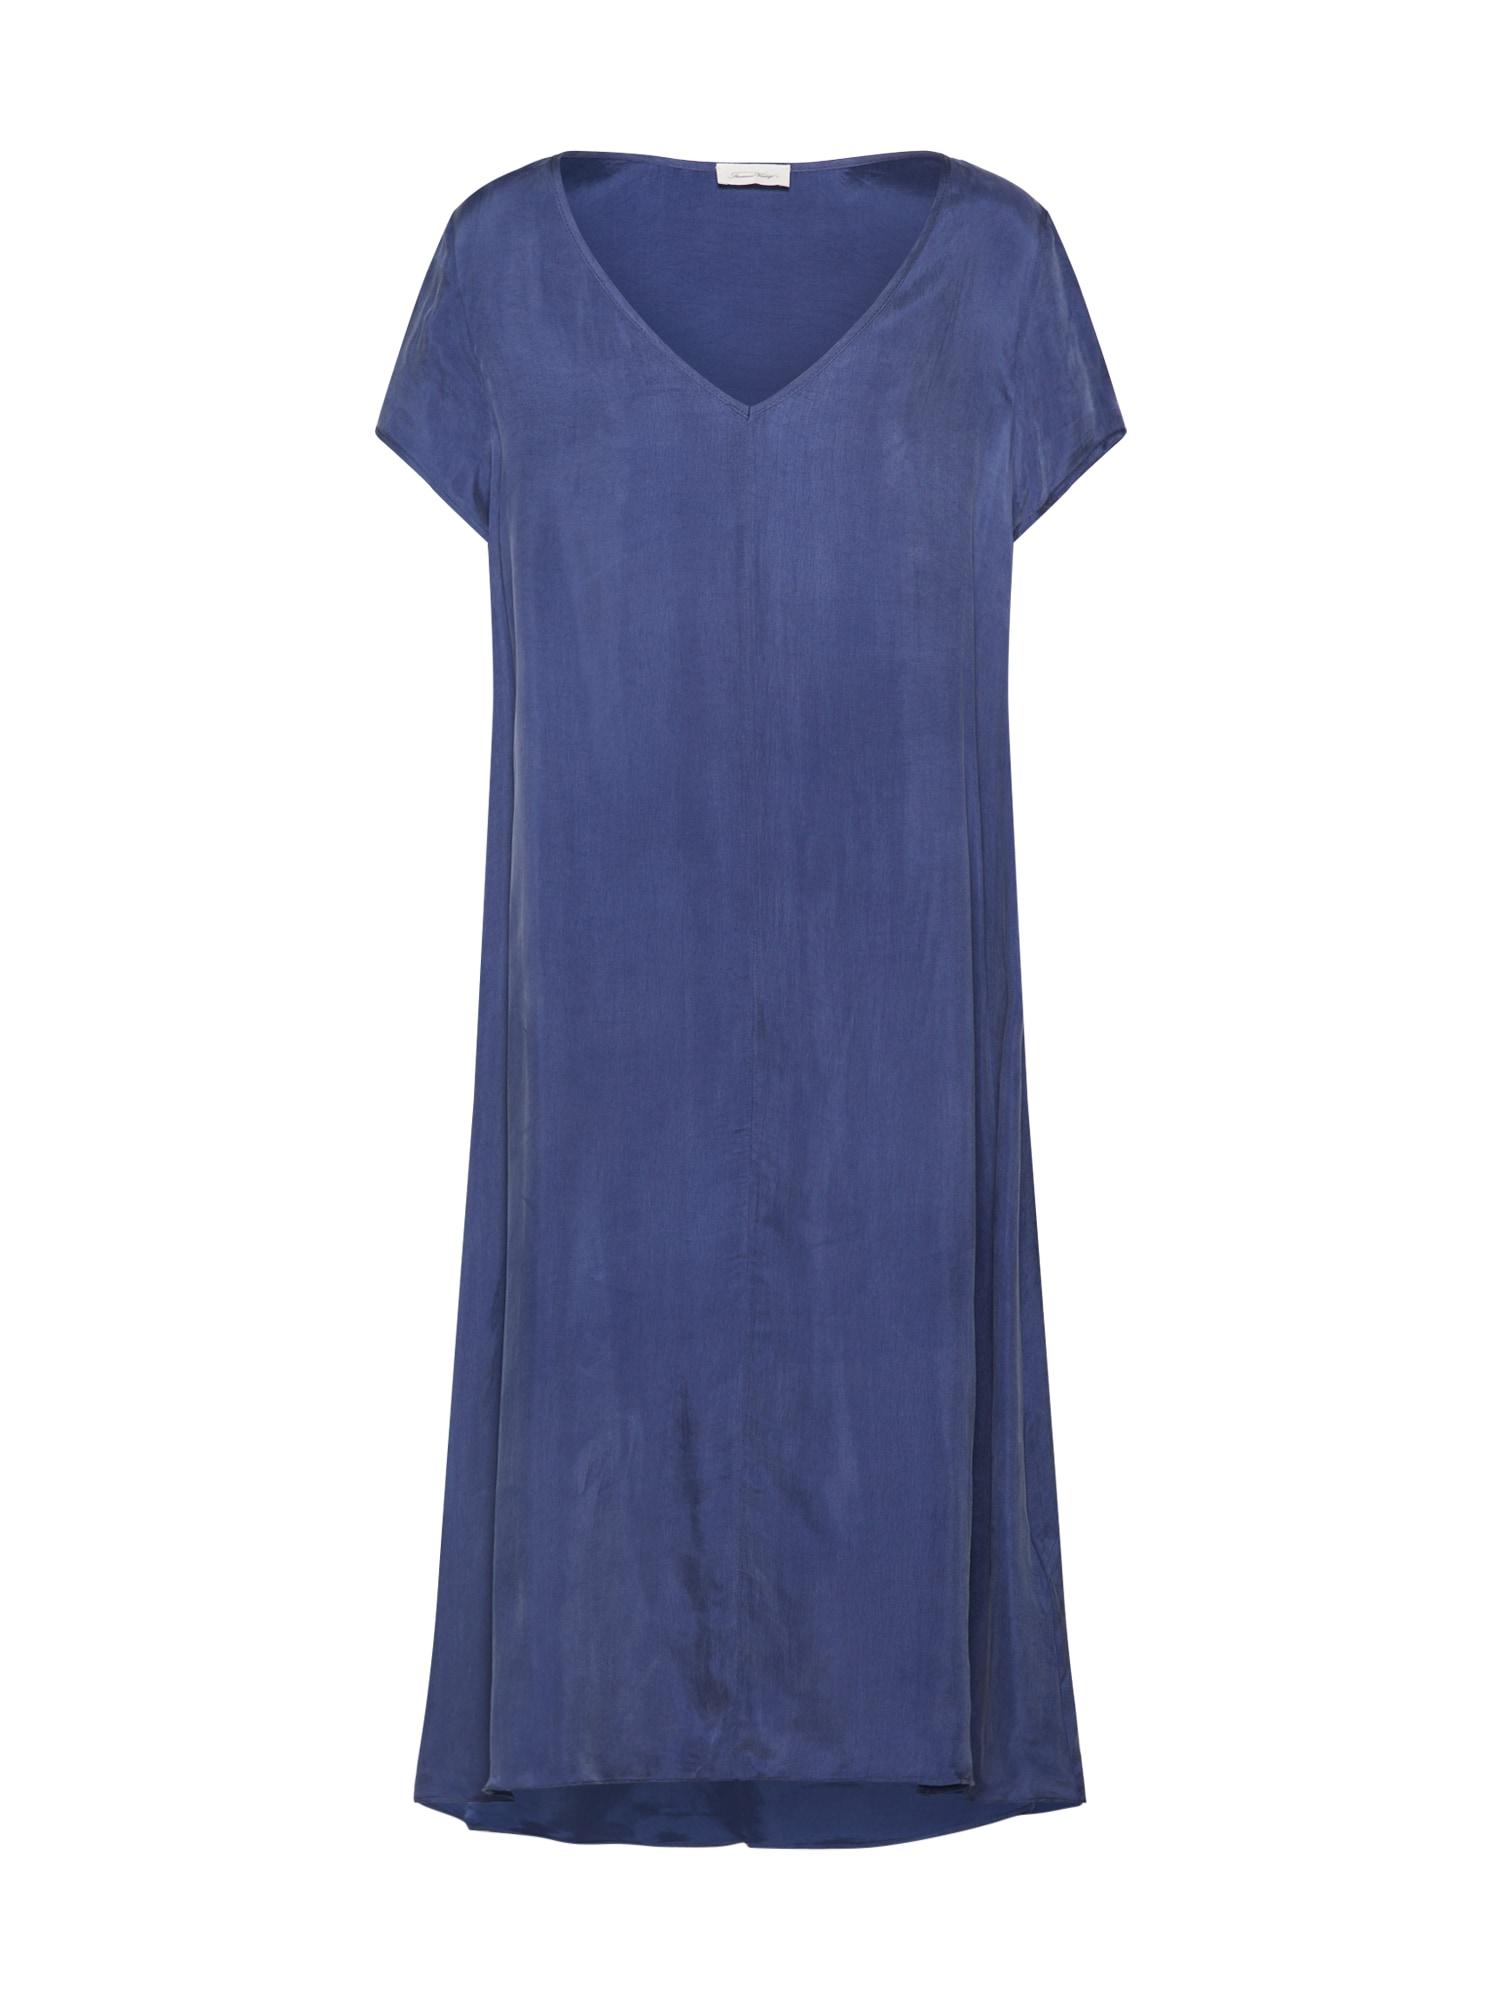 AMERICAN VINTAGE Suknelė 'NONOGARDEN' tamsiai mėlyna